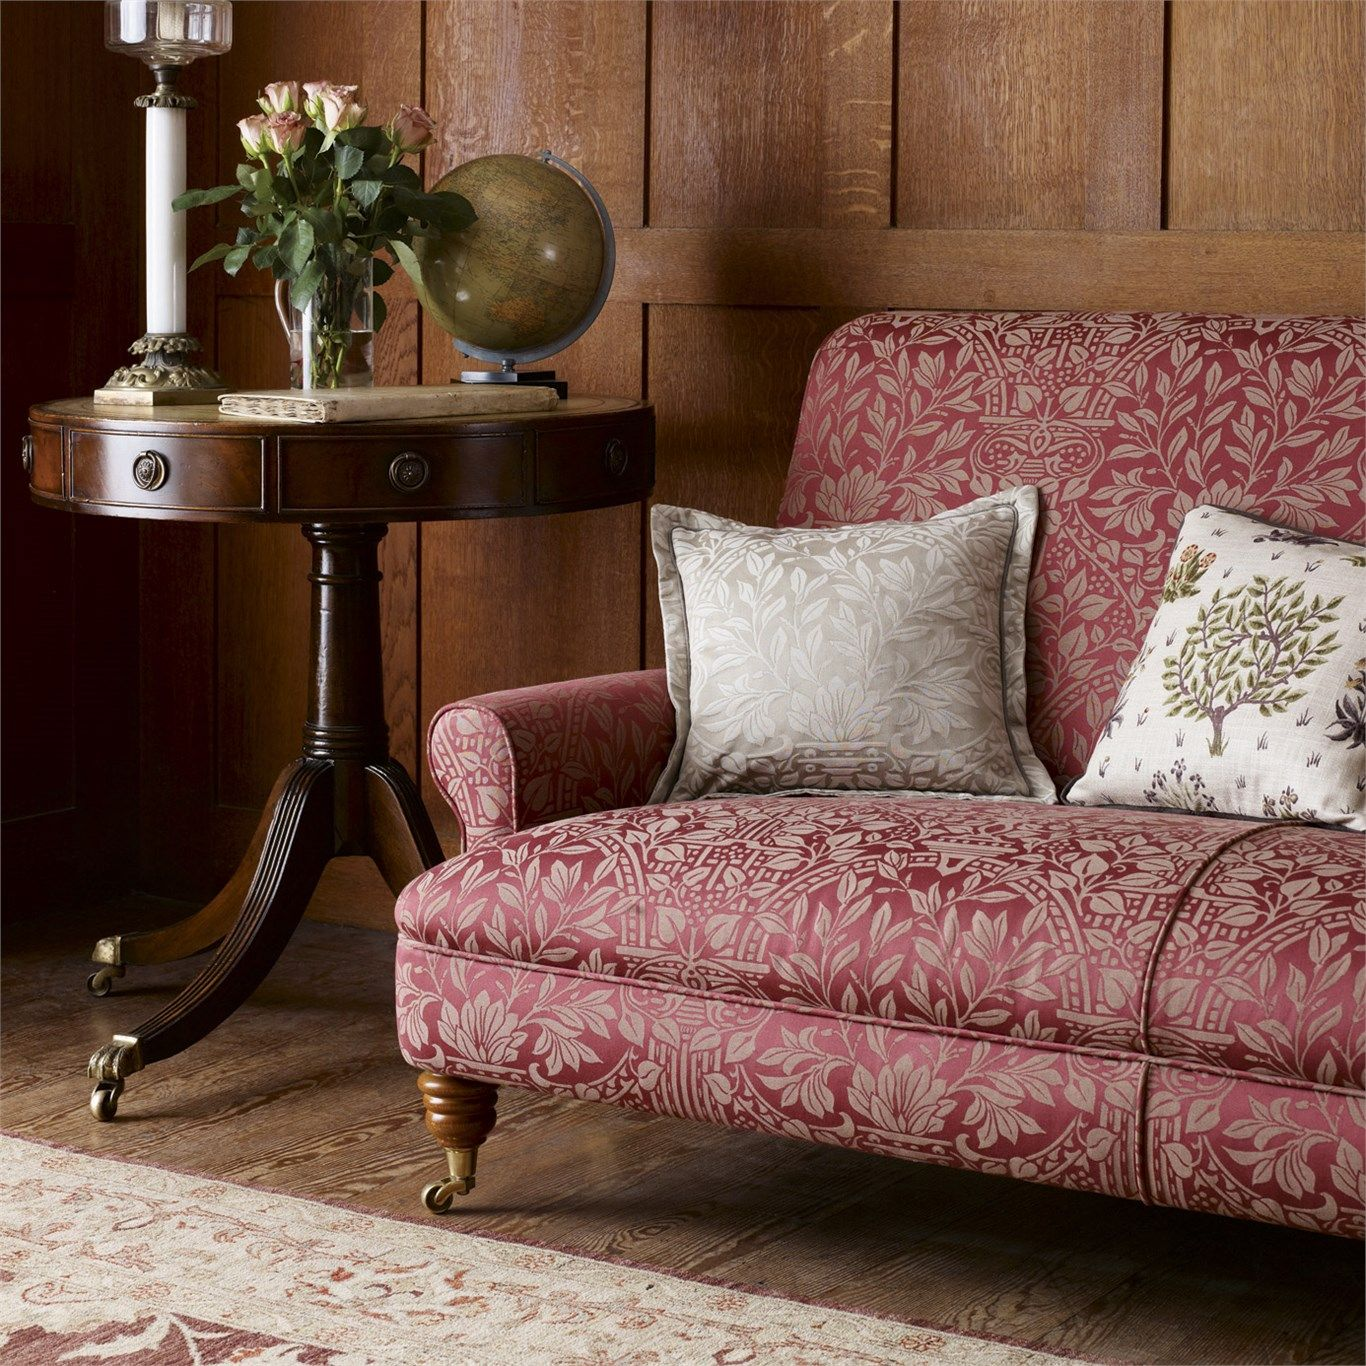 The Original Morris Co Arts And Crafts Fabrics And Wallpaper